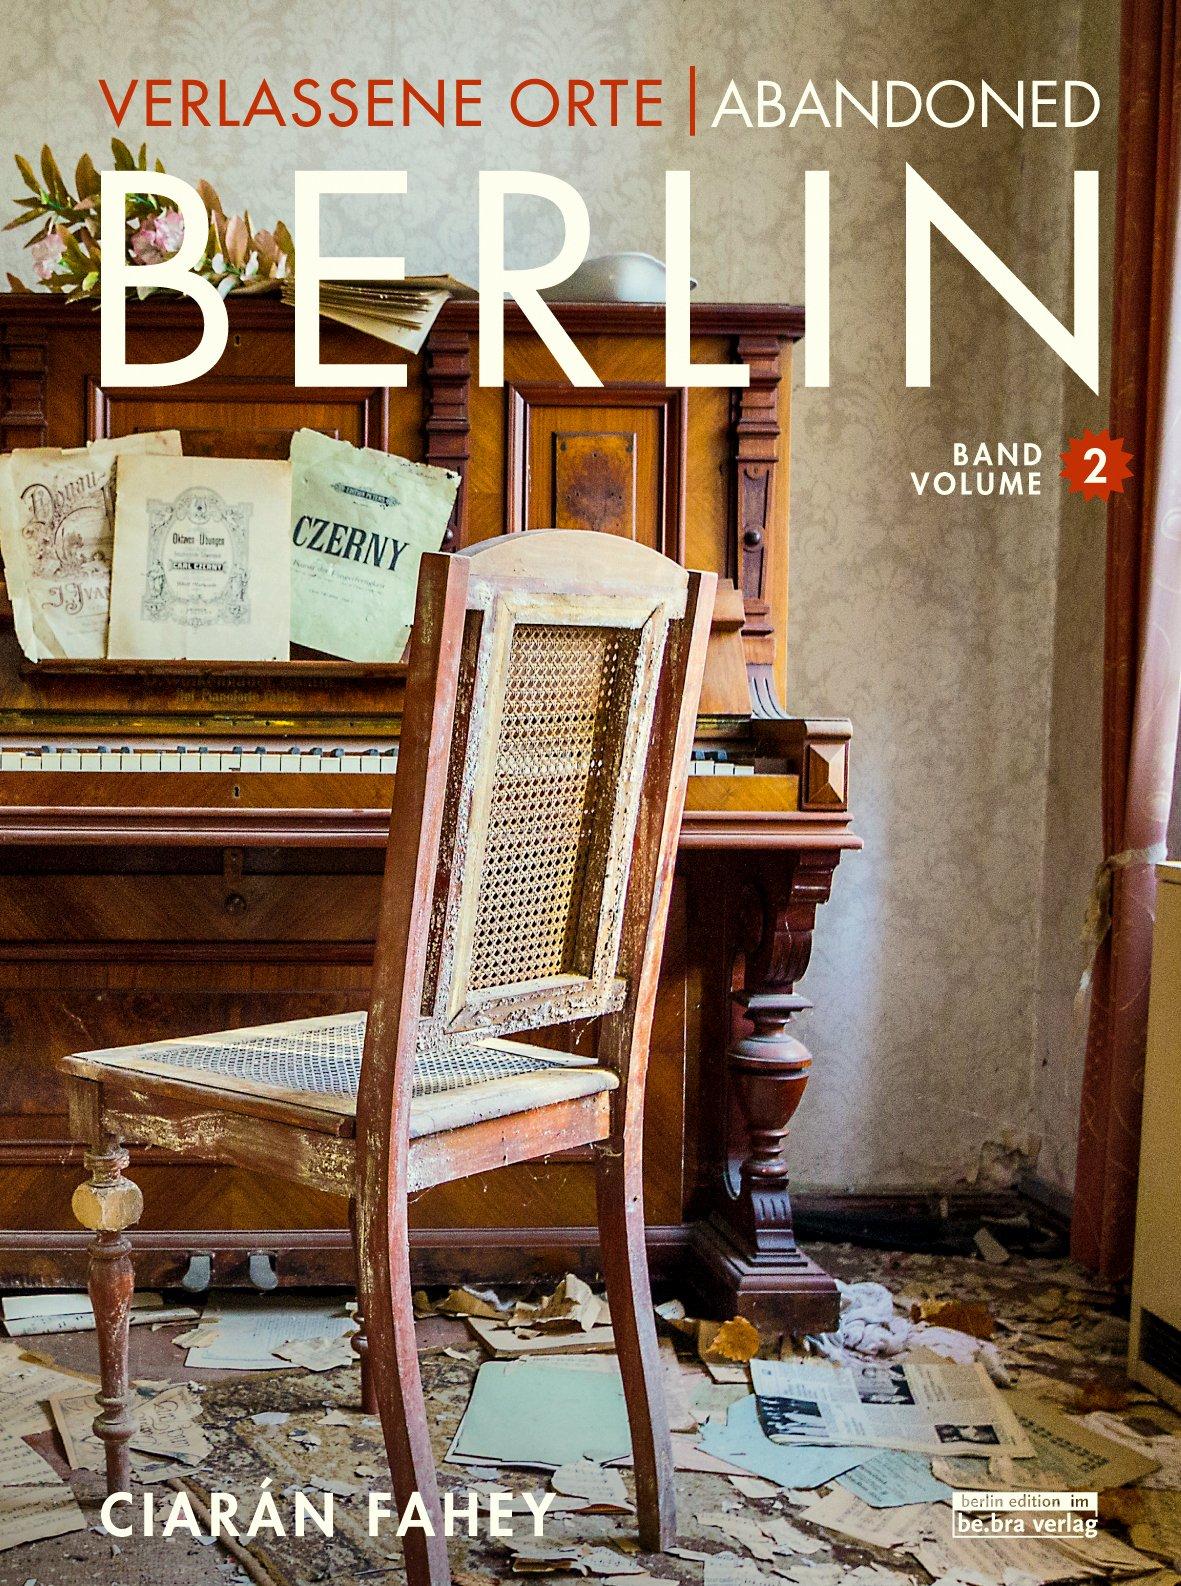 Verlassene Orte / Abandoned Berlin: Book 2